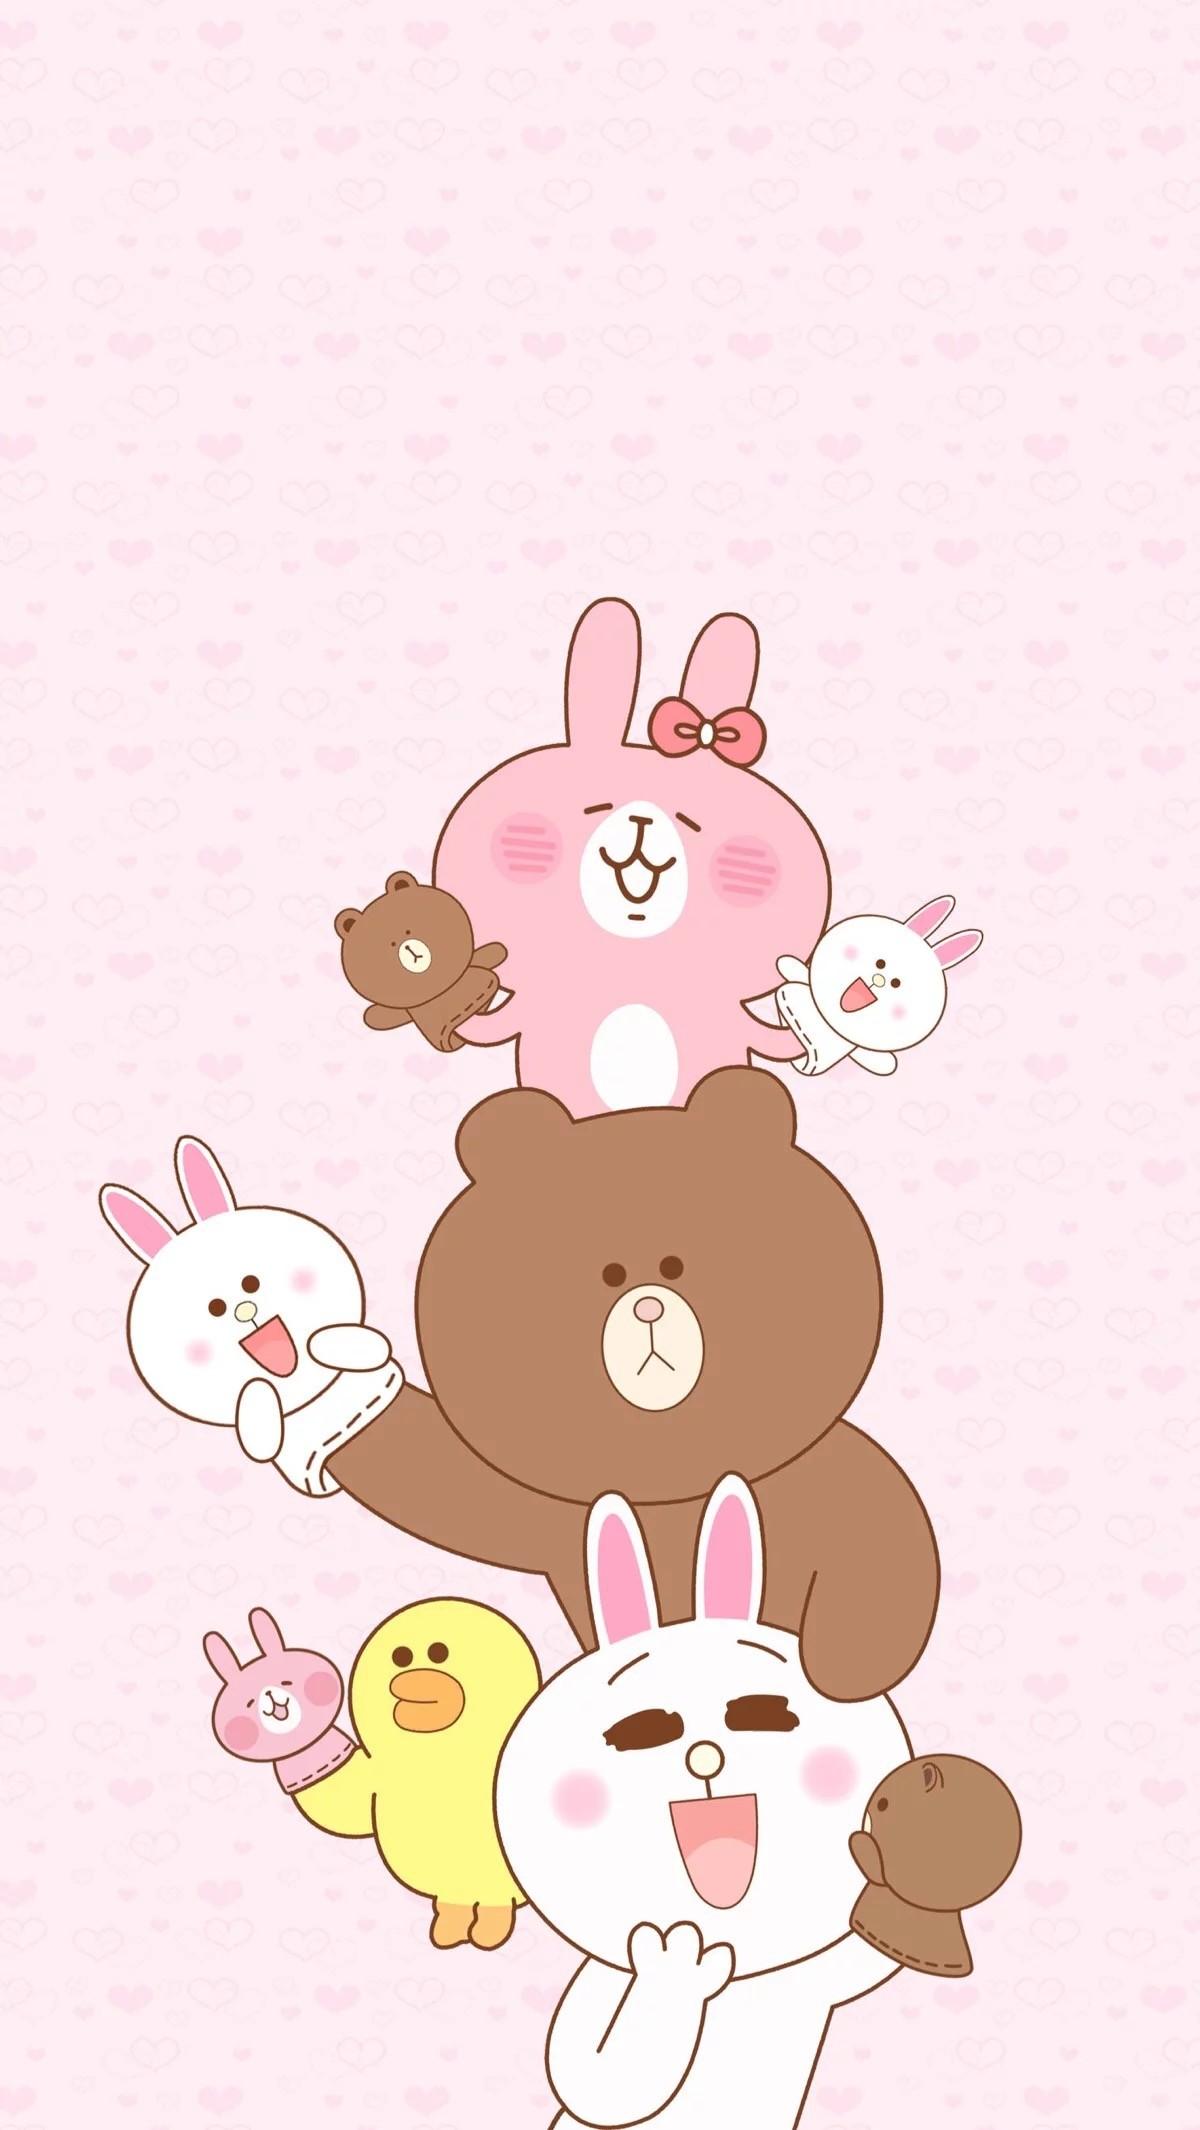 Kawaii Wallpaper, Kawaii Things, Brow, Sanrio, Phone Wallpapers, Iphone 7,  Sticker, Cartoon, Layout